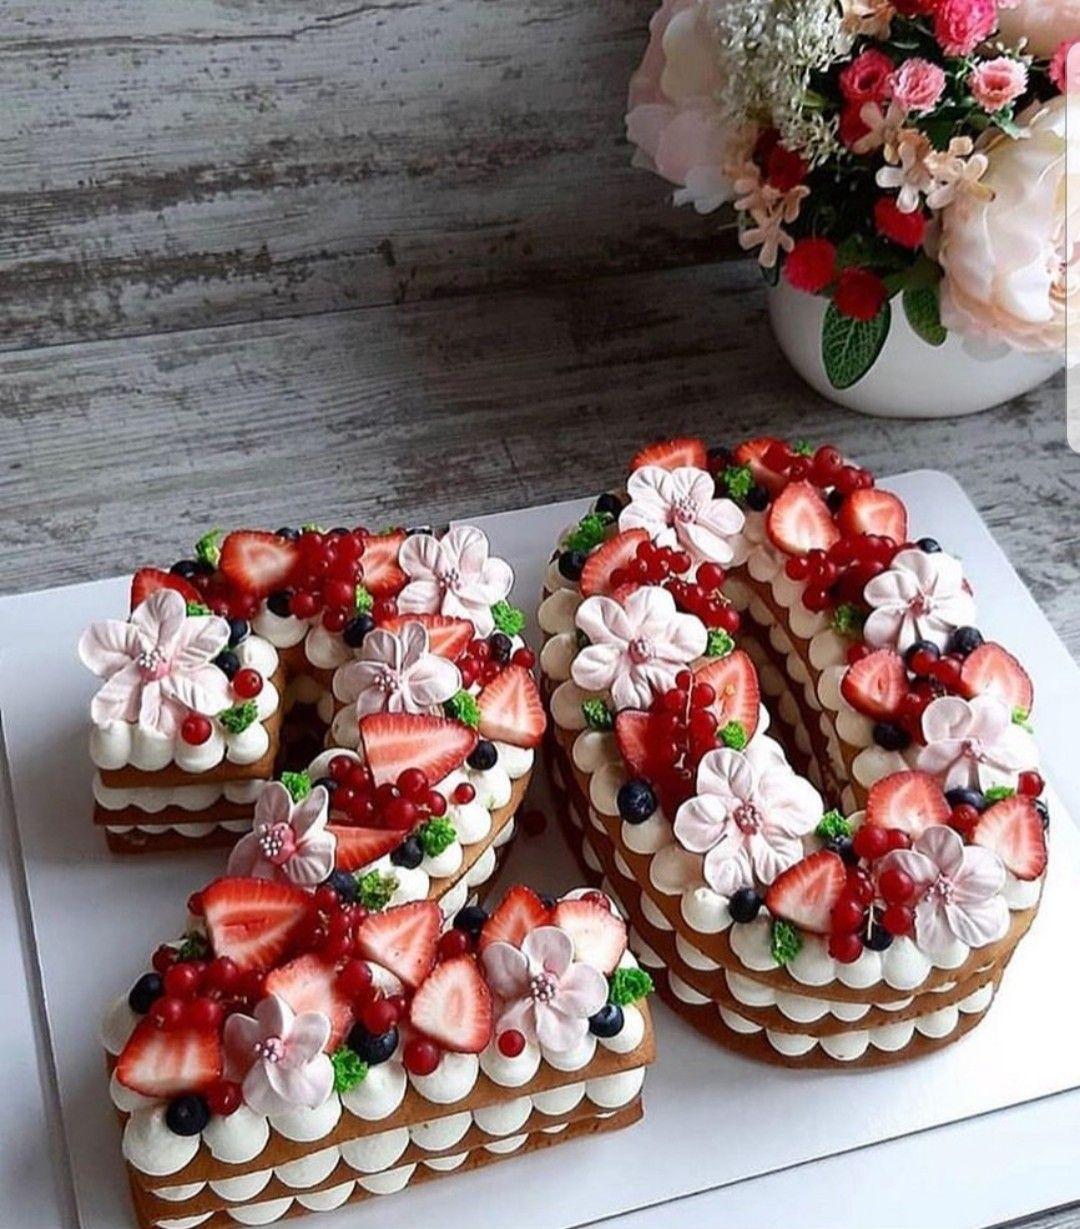 Pin Von Yildirim Zanajana Auf Celebratings Cakes Kindergeburtstagstorte Motivtorten Backen